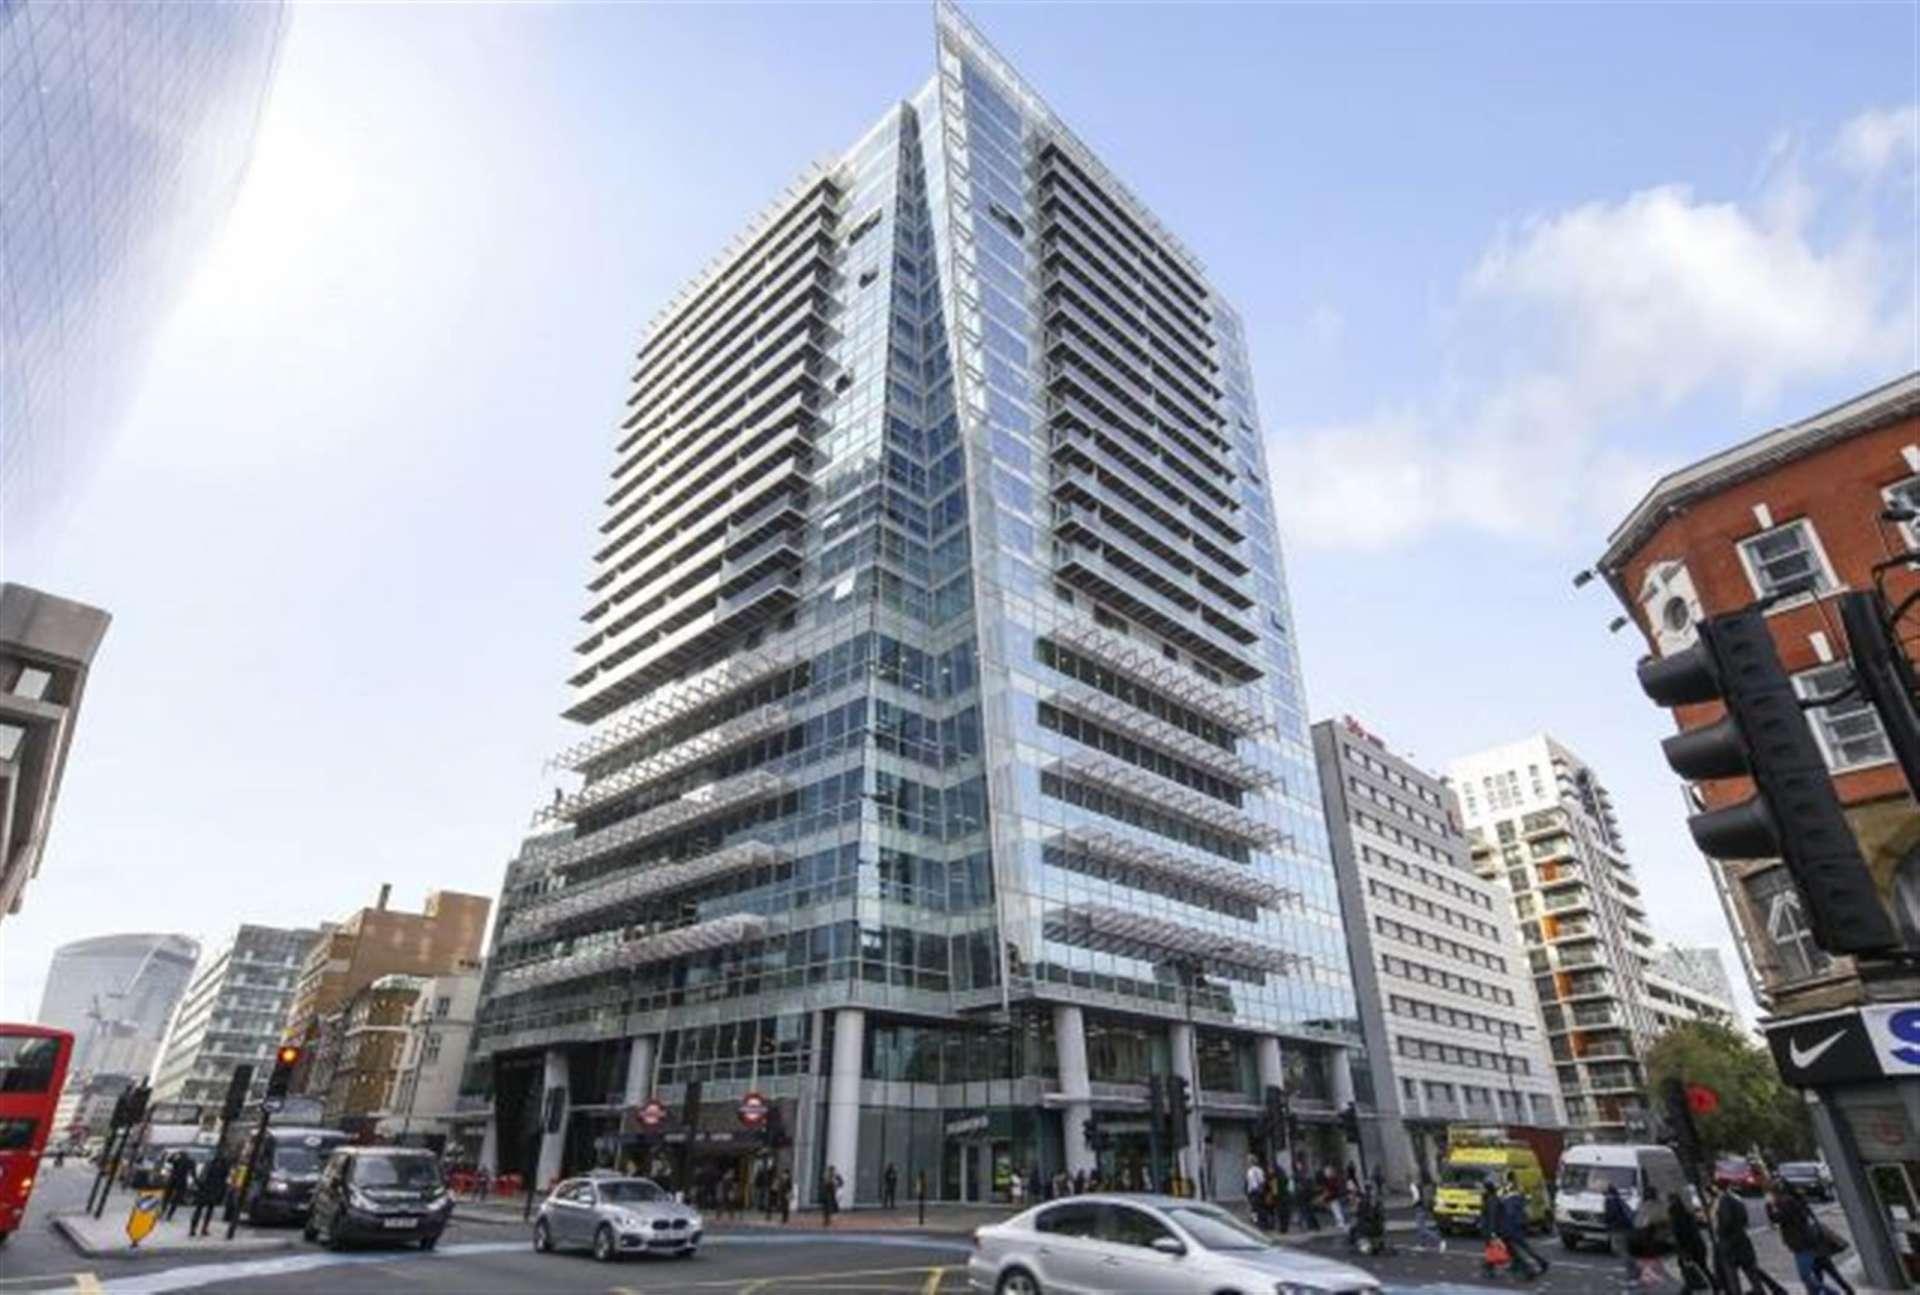 Crawford Building, 112 Whitechapel High Street, Aldgate, London, E1